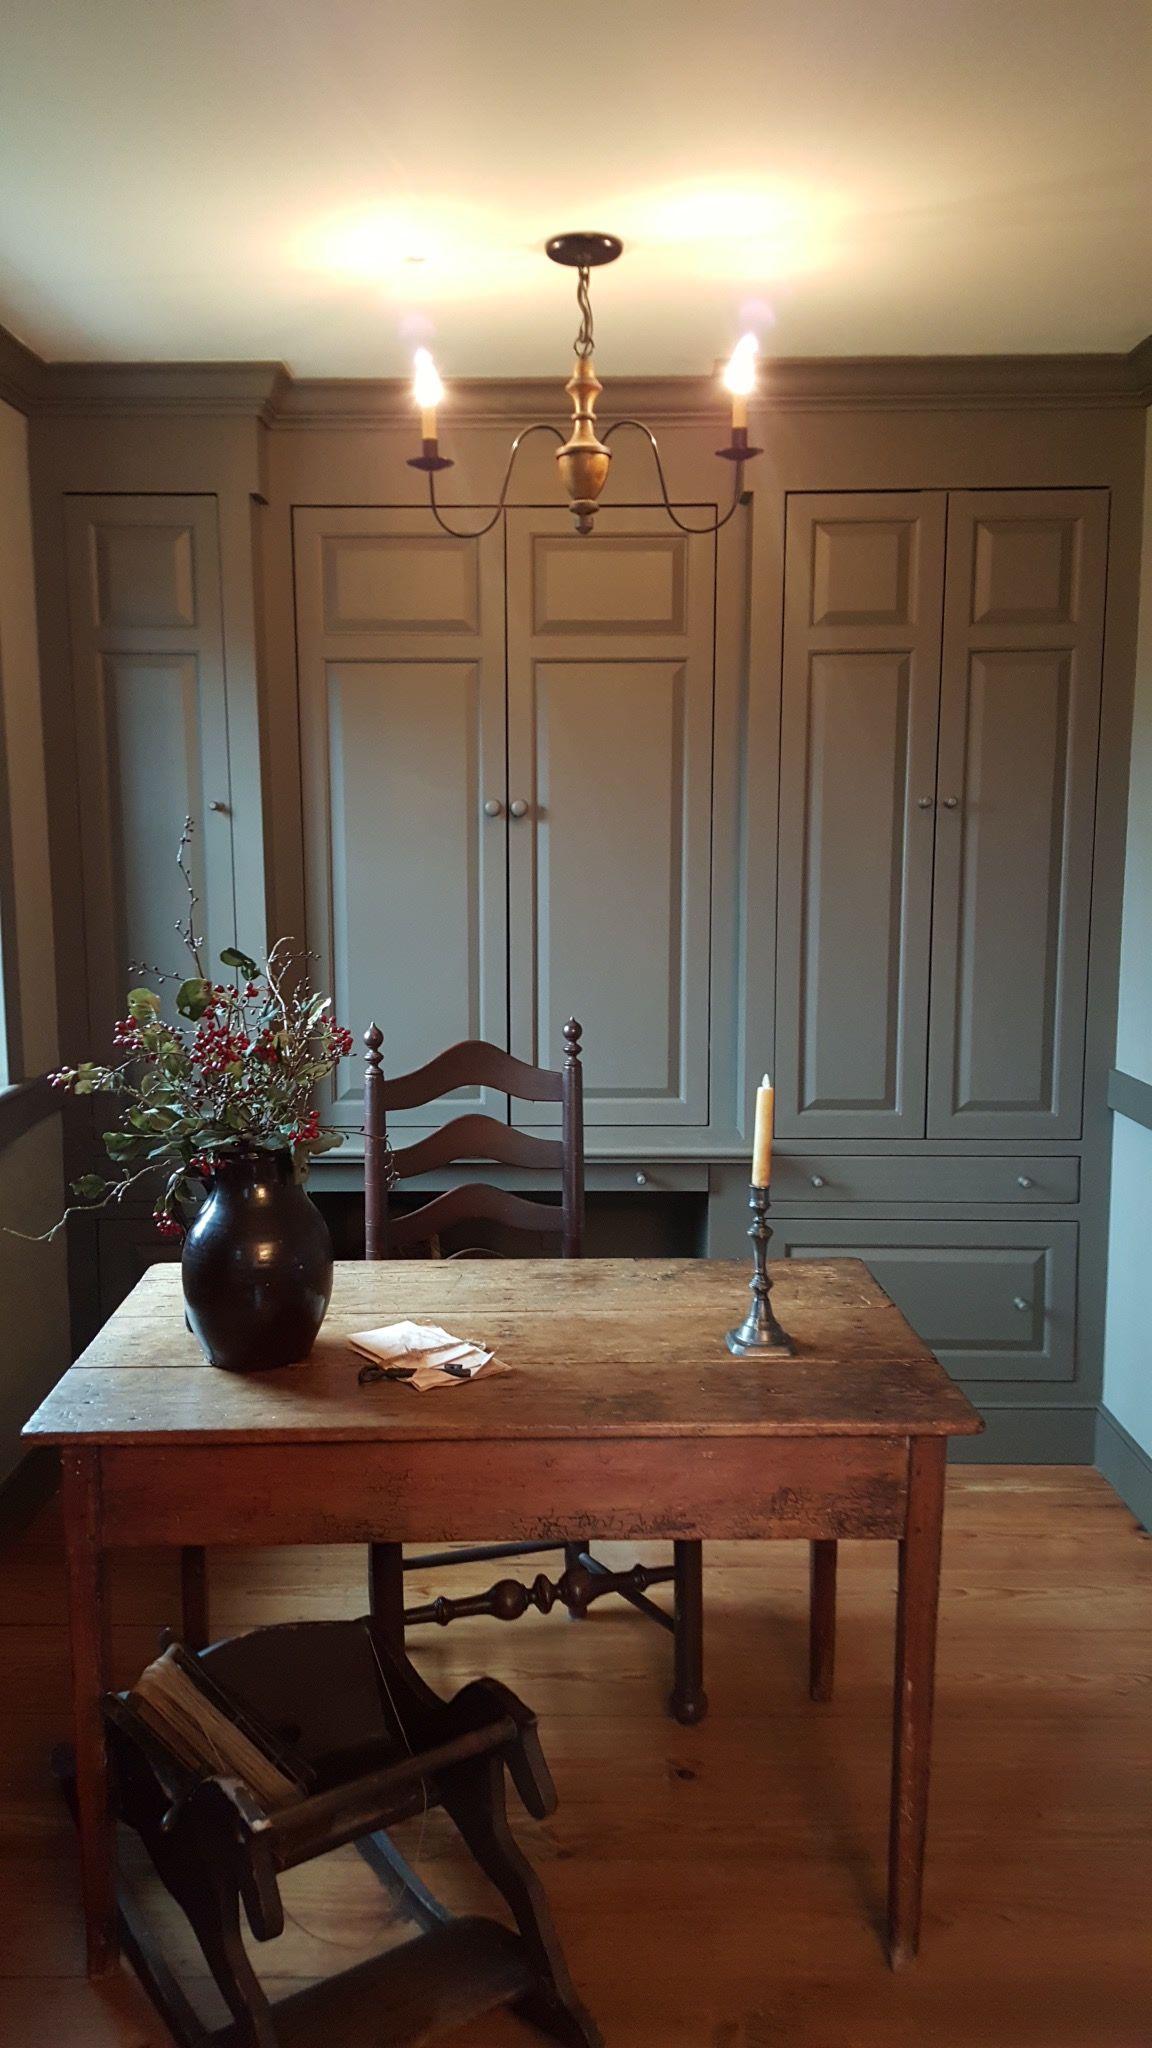 Pin di Natalie Ward su Primitive Kitchens & Dining Rooms | Pinterest